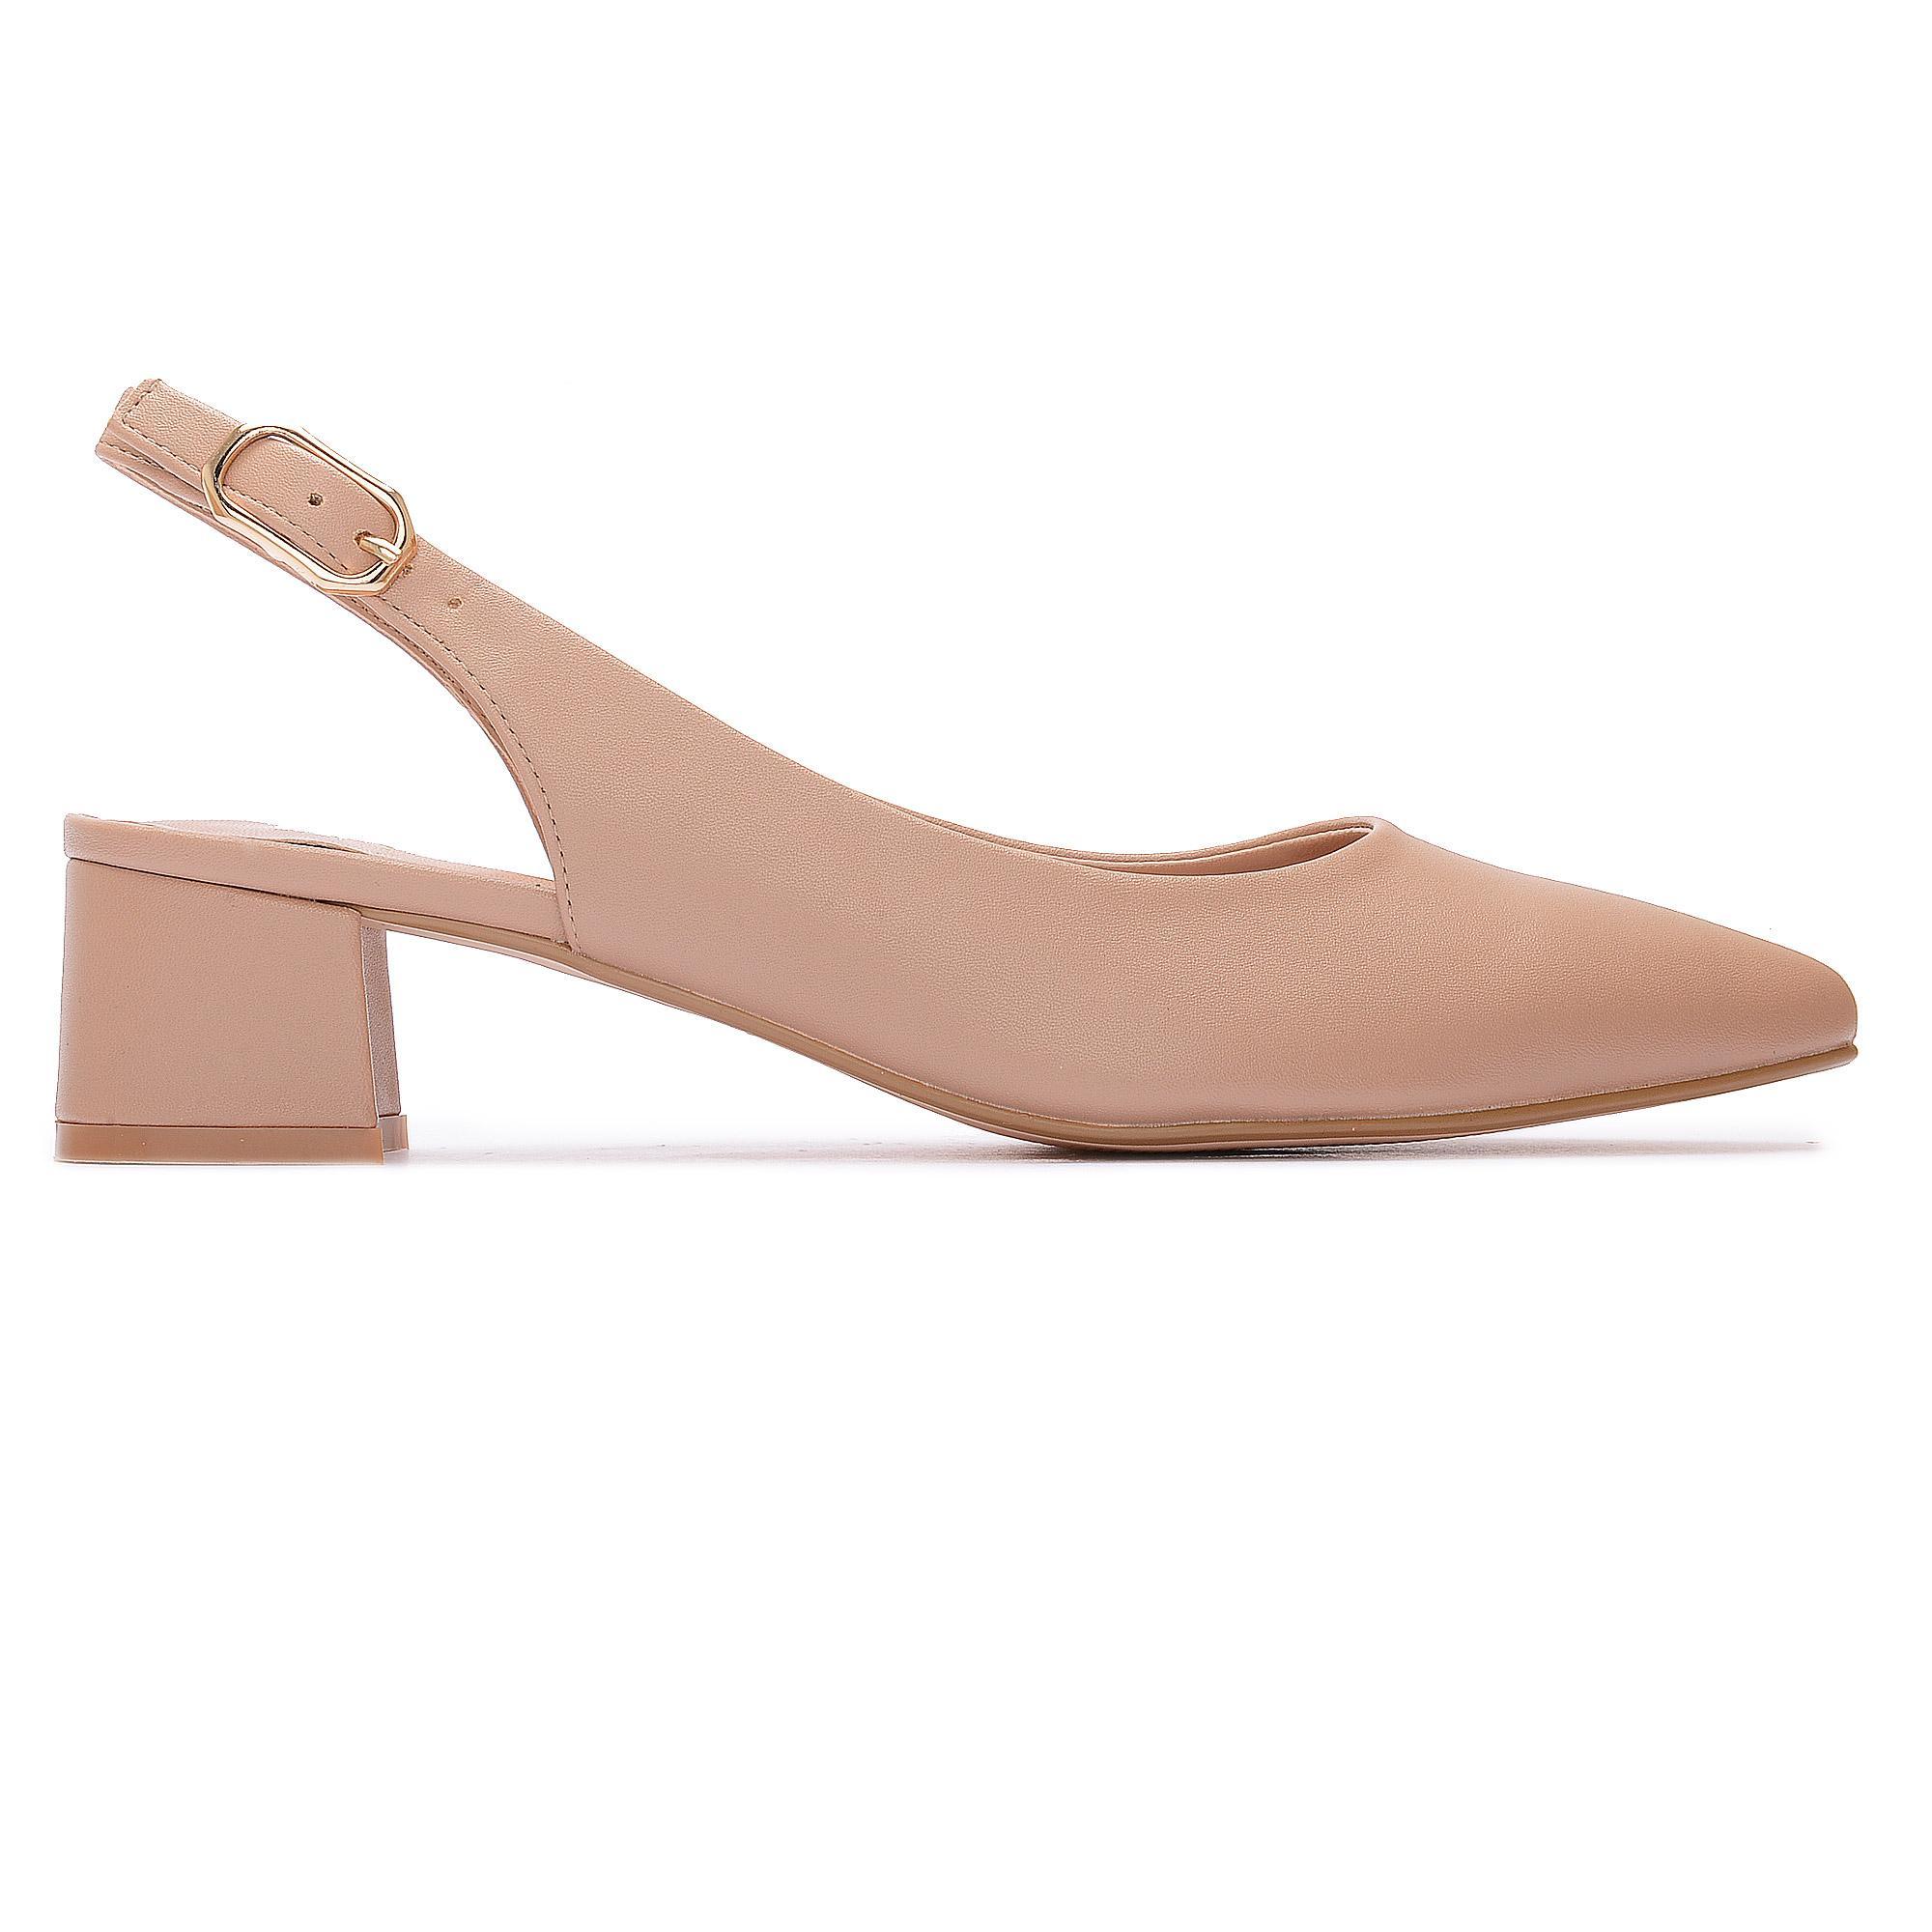 Bata Ladies Heels 6115116 By Bata.